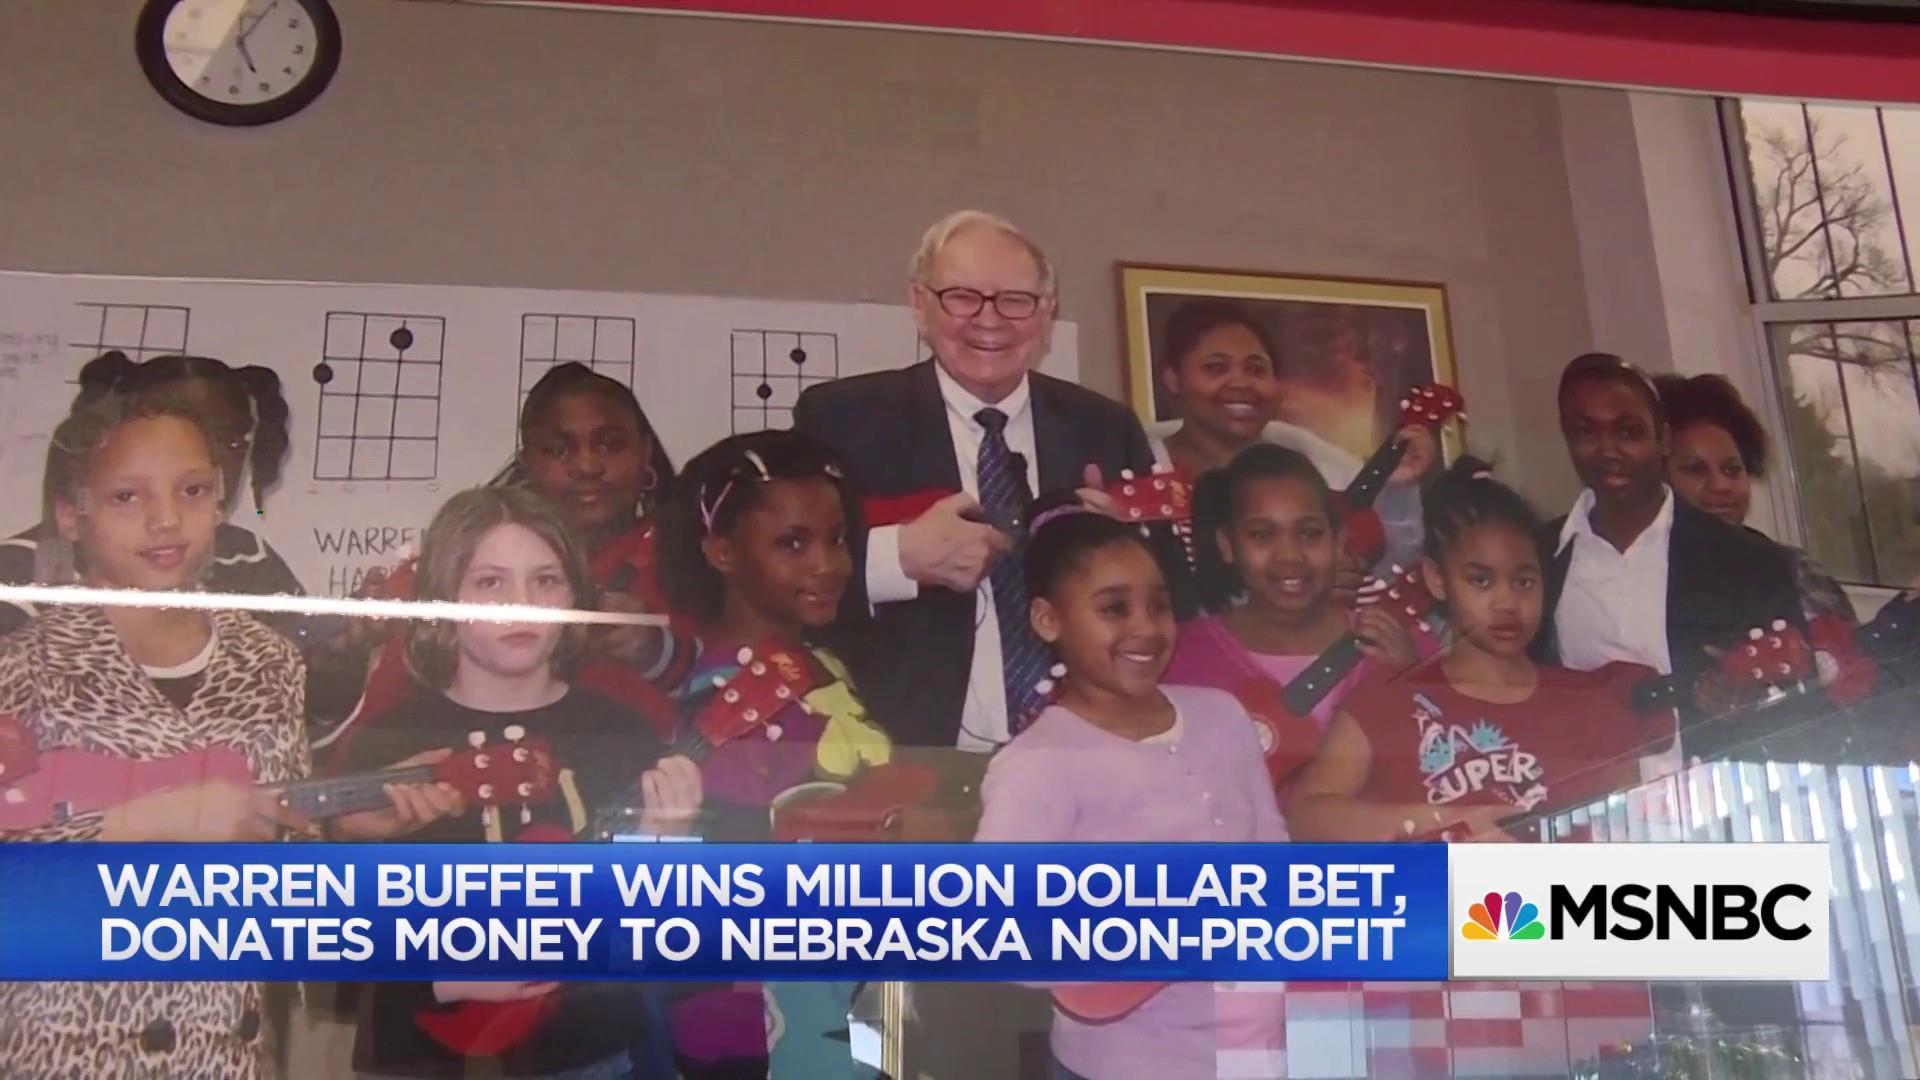 Good news somewhere: Warren Buffet's million dollar donation